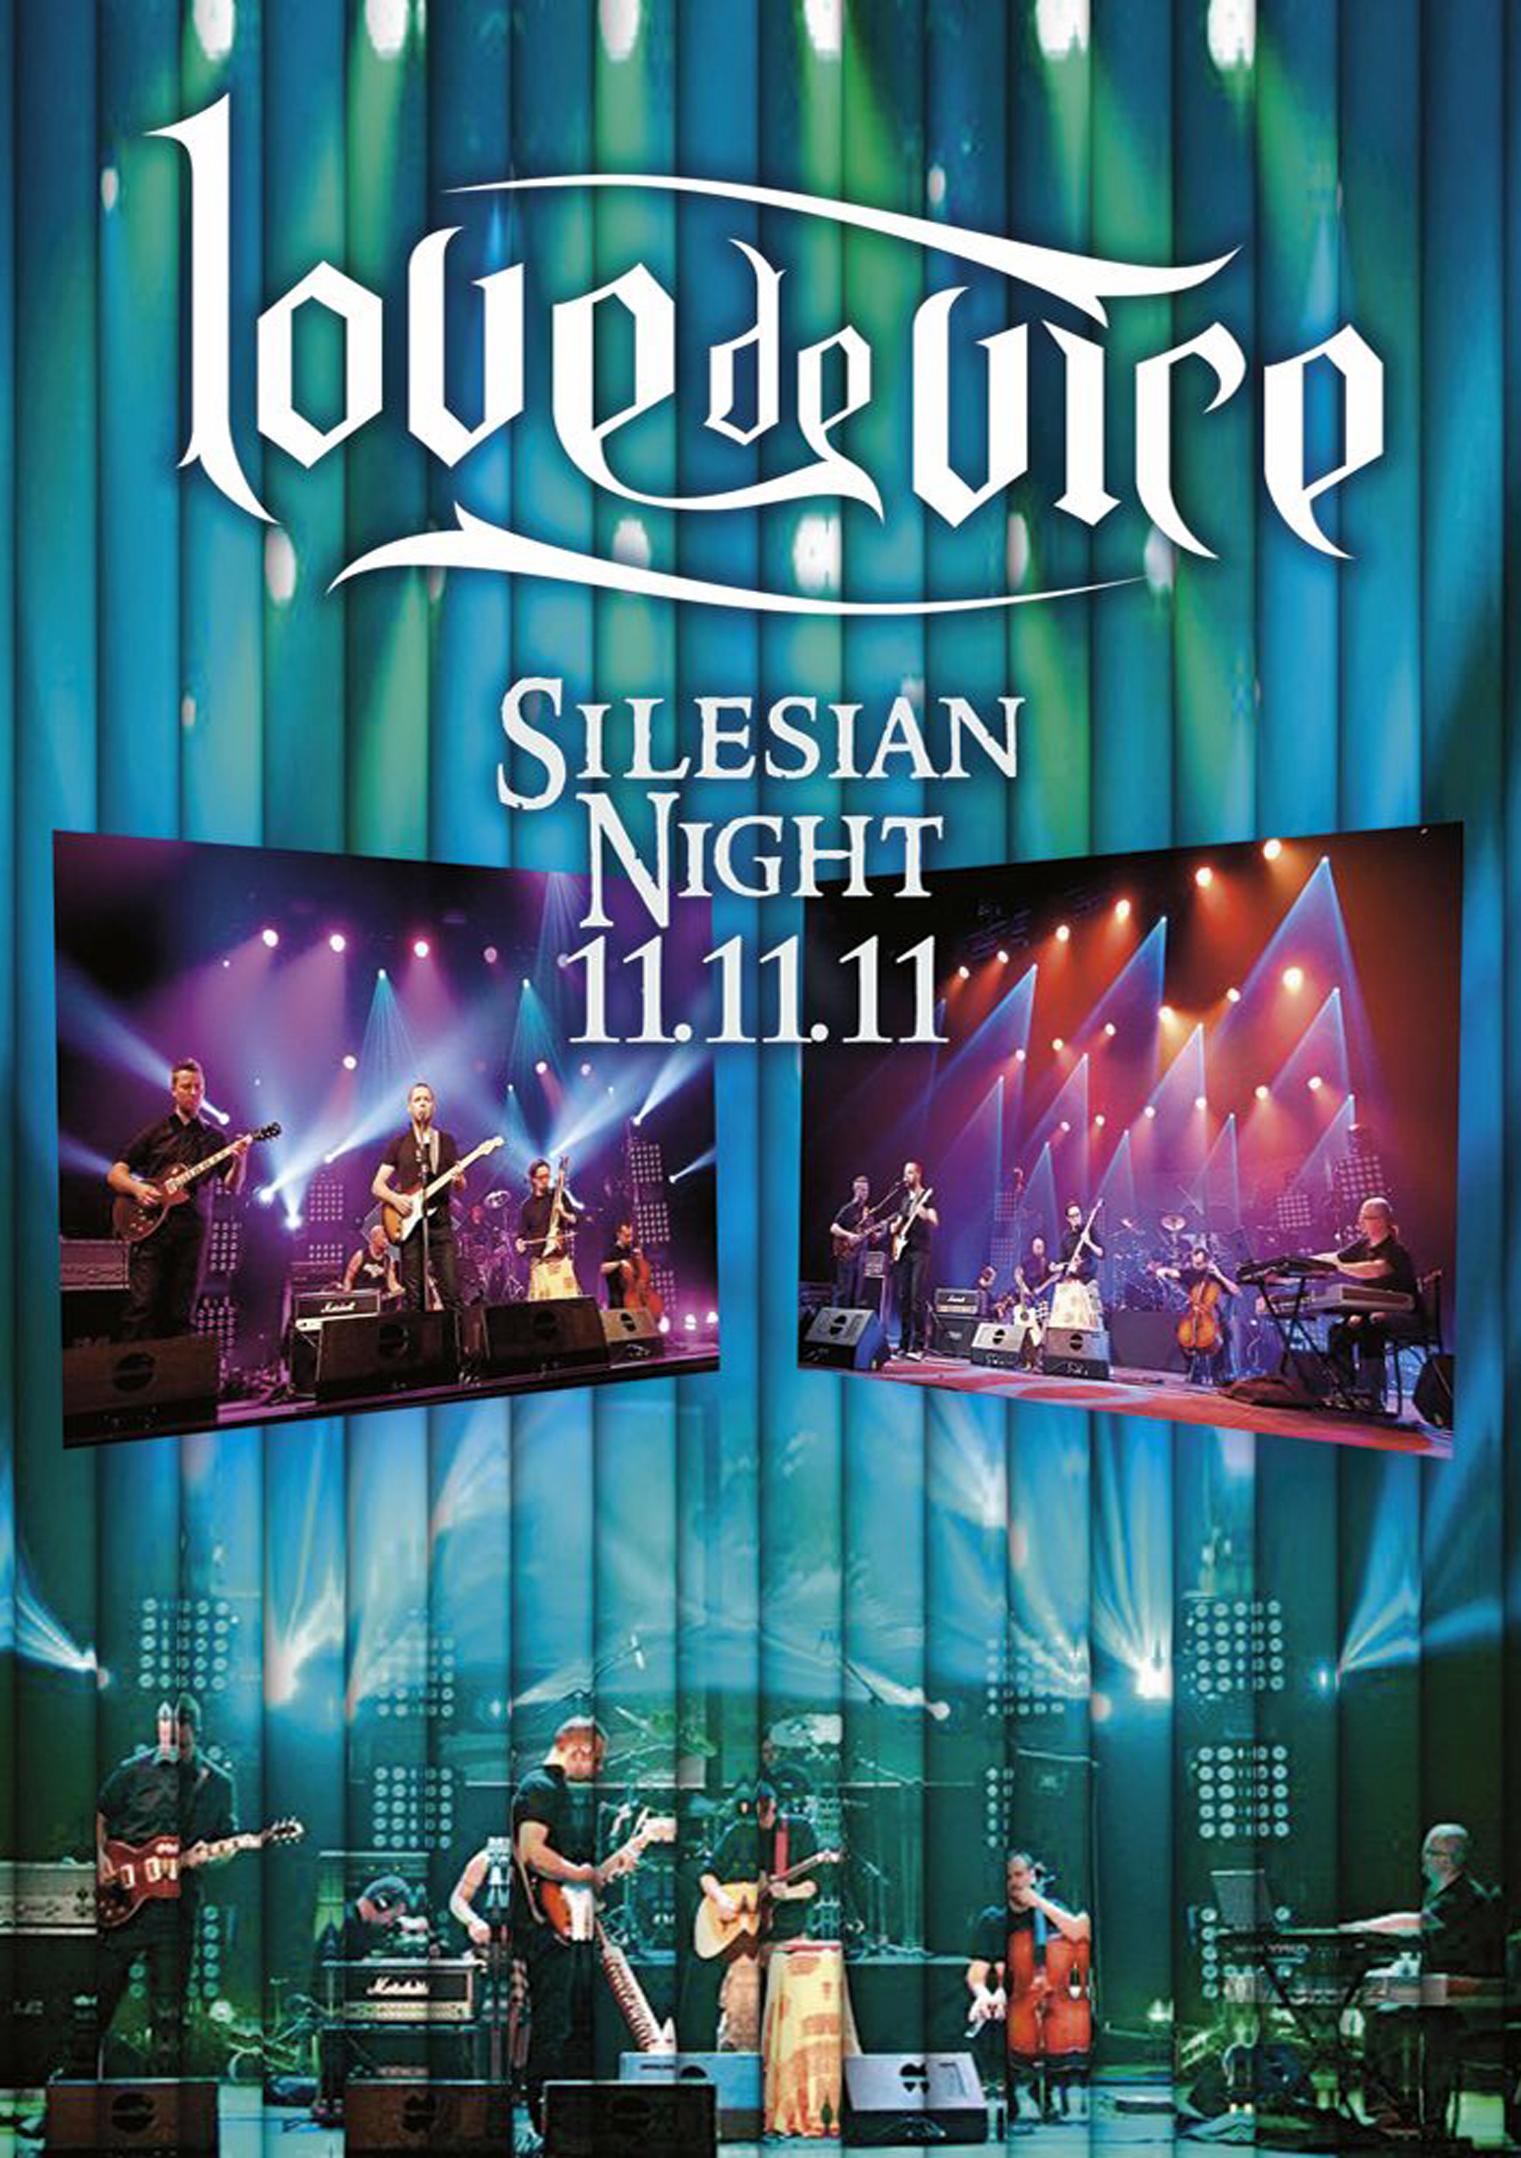 Love de Vice: Silesian Night 11.11.11